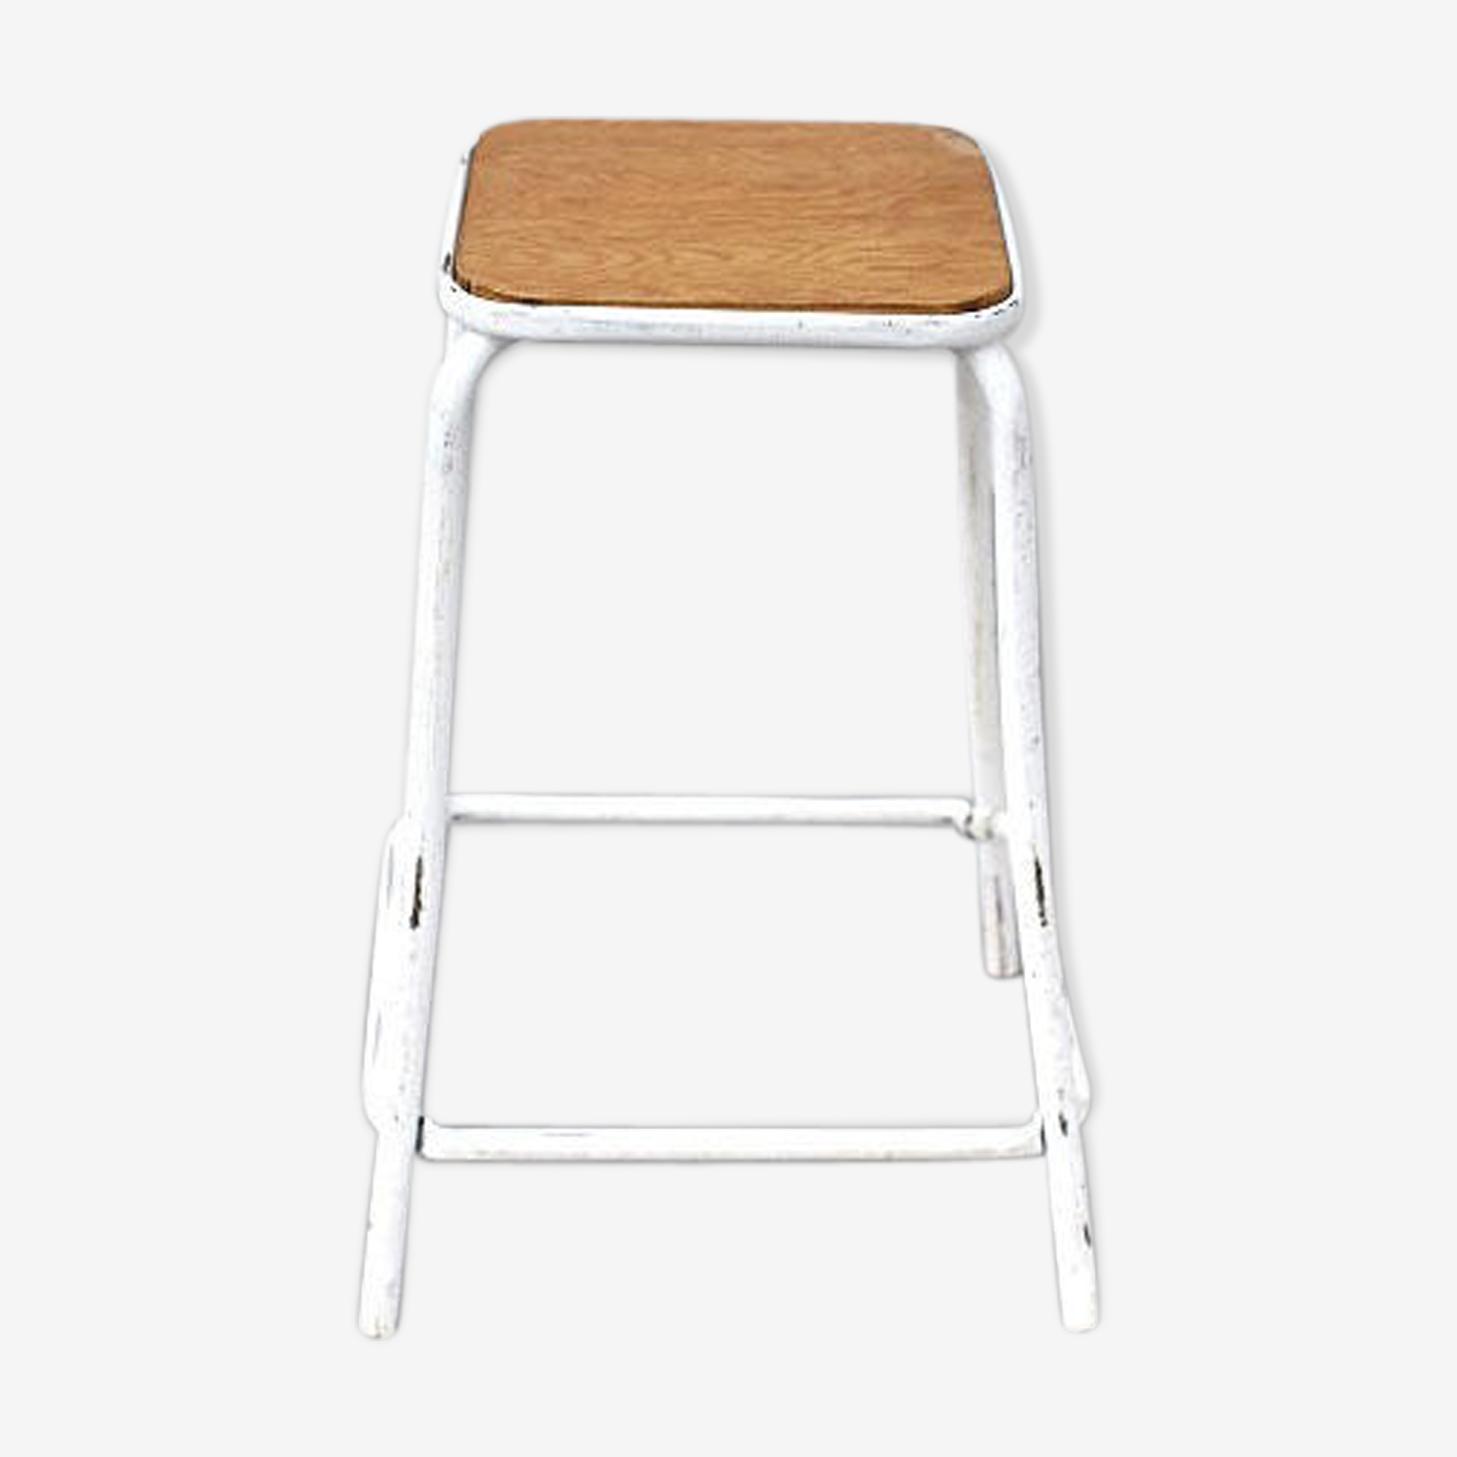 School stool